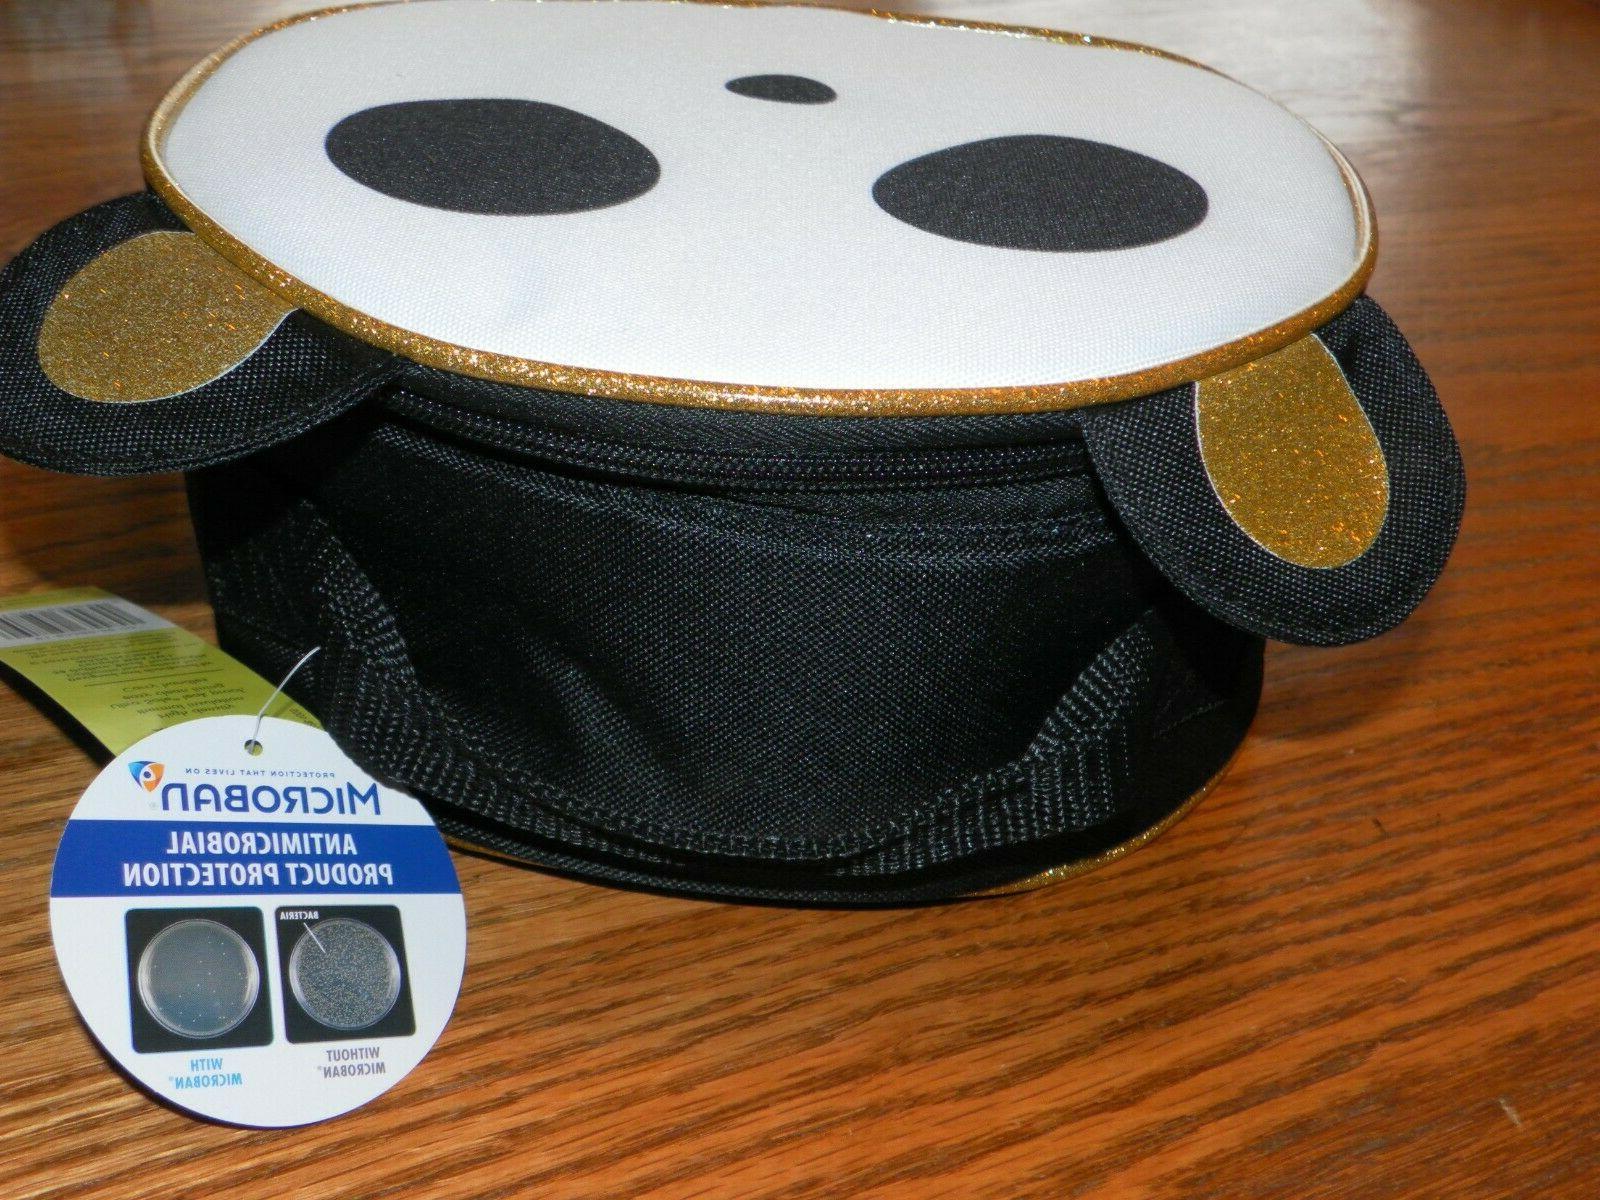 Arctic Zone PANDA Lunch Box Microban Antimicrobial